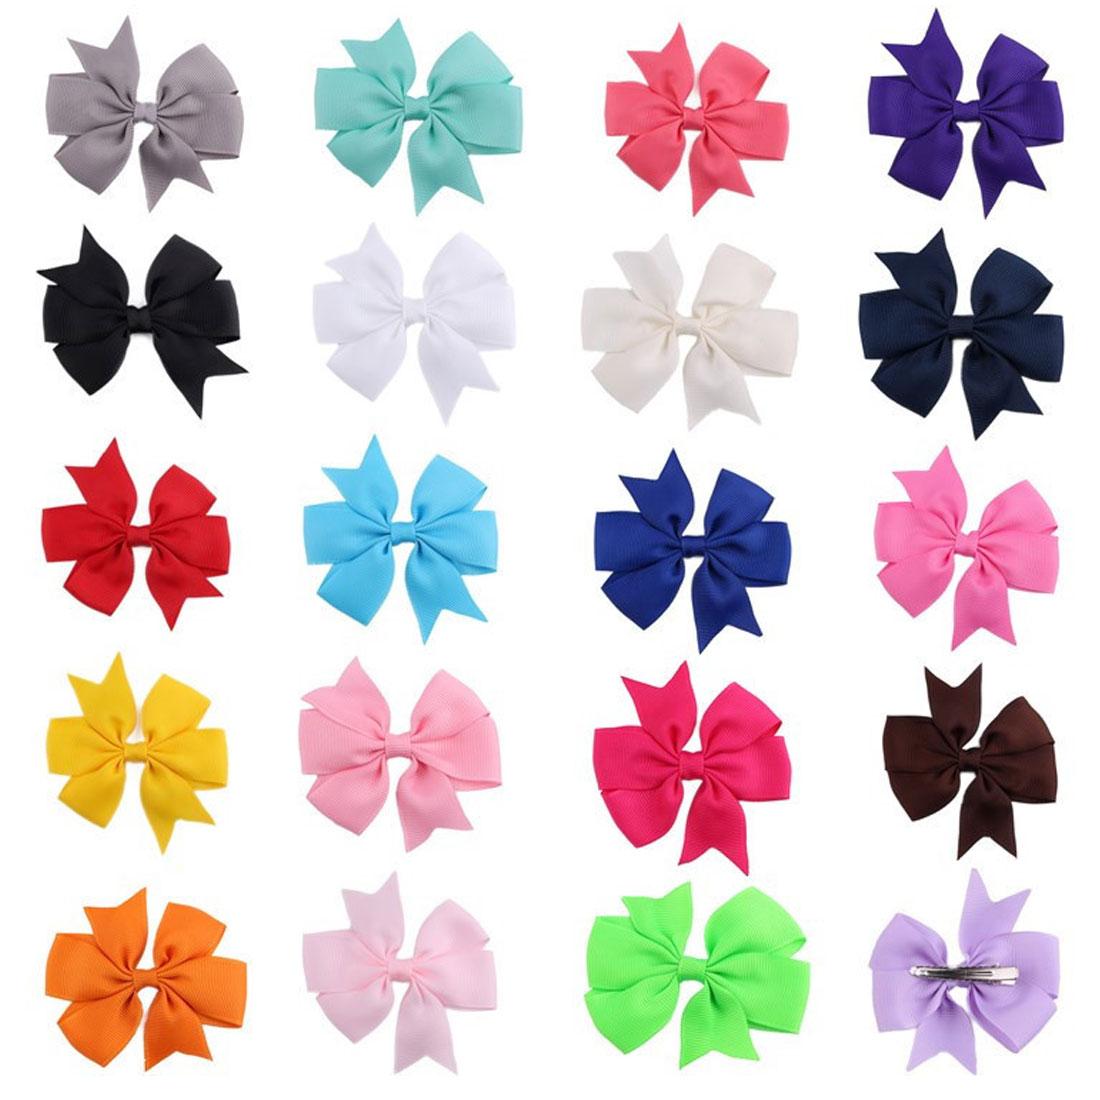 1PCS/Lot Colors Ribbon Bows Hair Bands Hairpin Girls hair bows Boutique Clip Headwear Kids Accessories